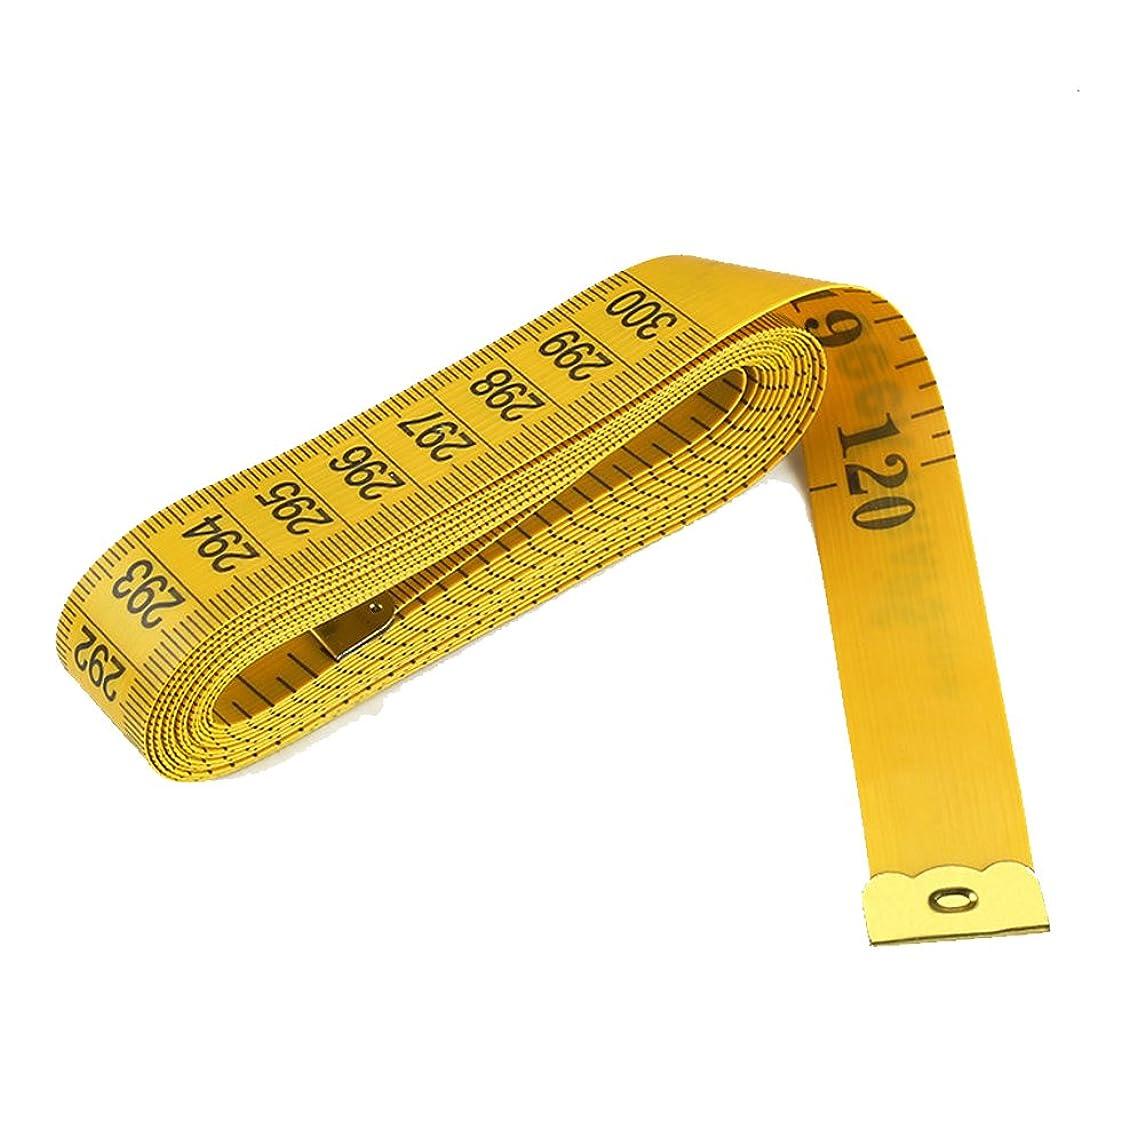 Tape Measure 120Inch 300 cm Tailor Tape Measure Cloth Body Ruler Sewing Tape Measure